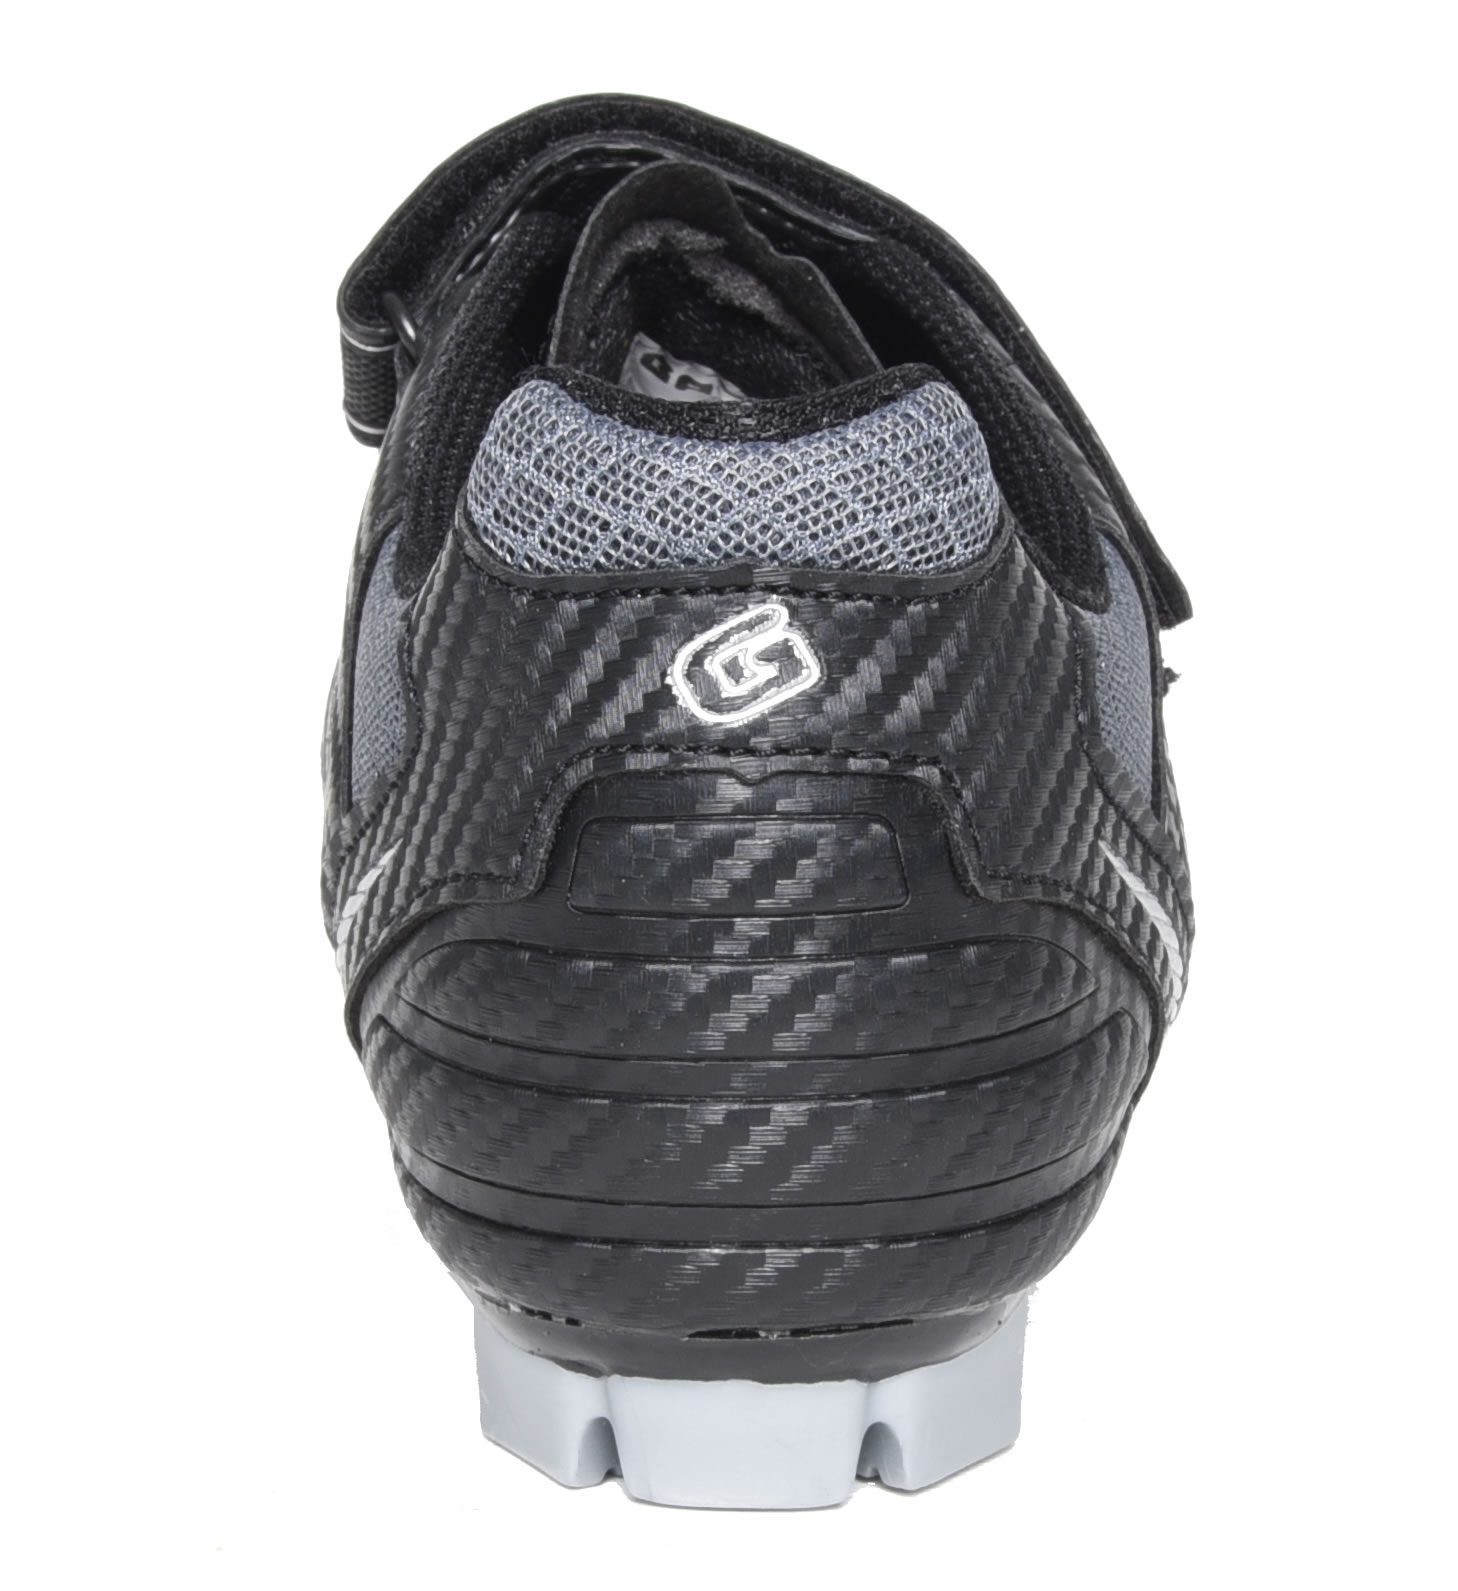 Gavin Mountain Bike Mountain Bike mesh Indoor Fitness Chaussures pour le cyclisme hommes femmes SPD